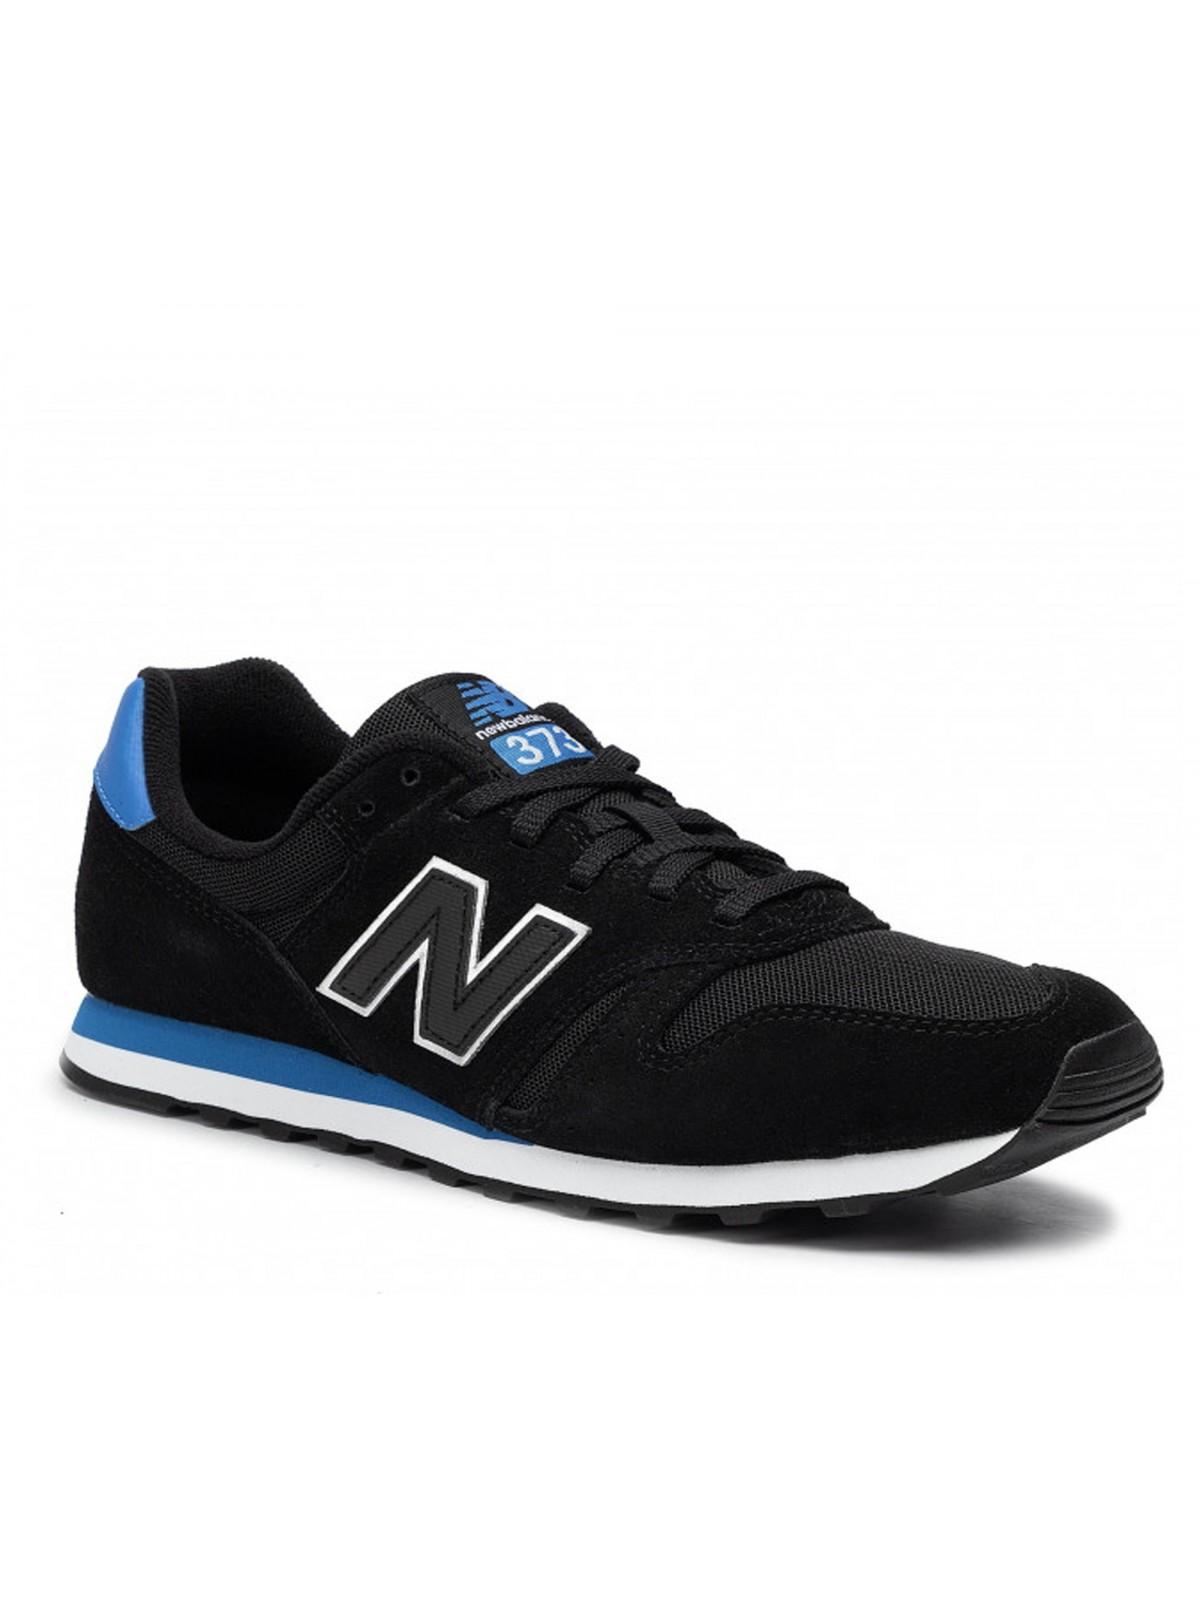 New Balance ML373 black / blue